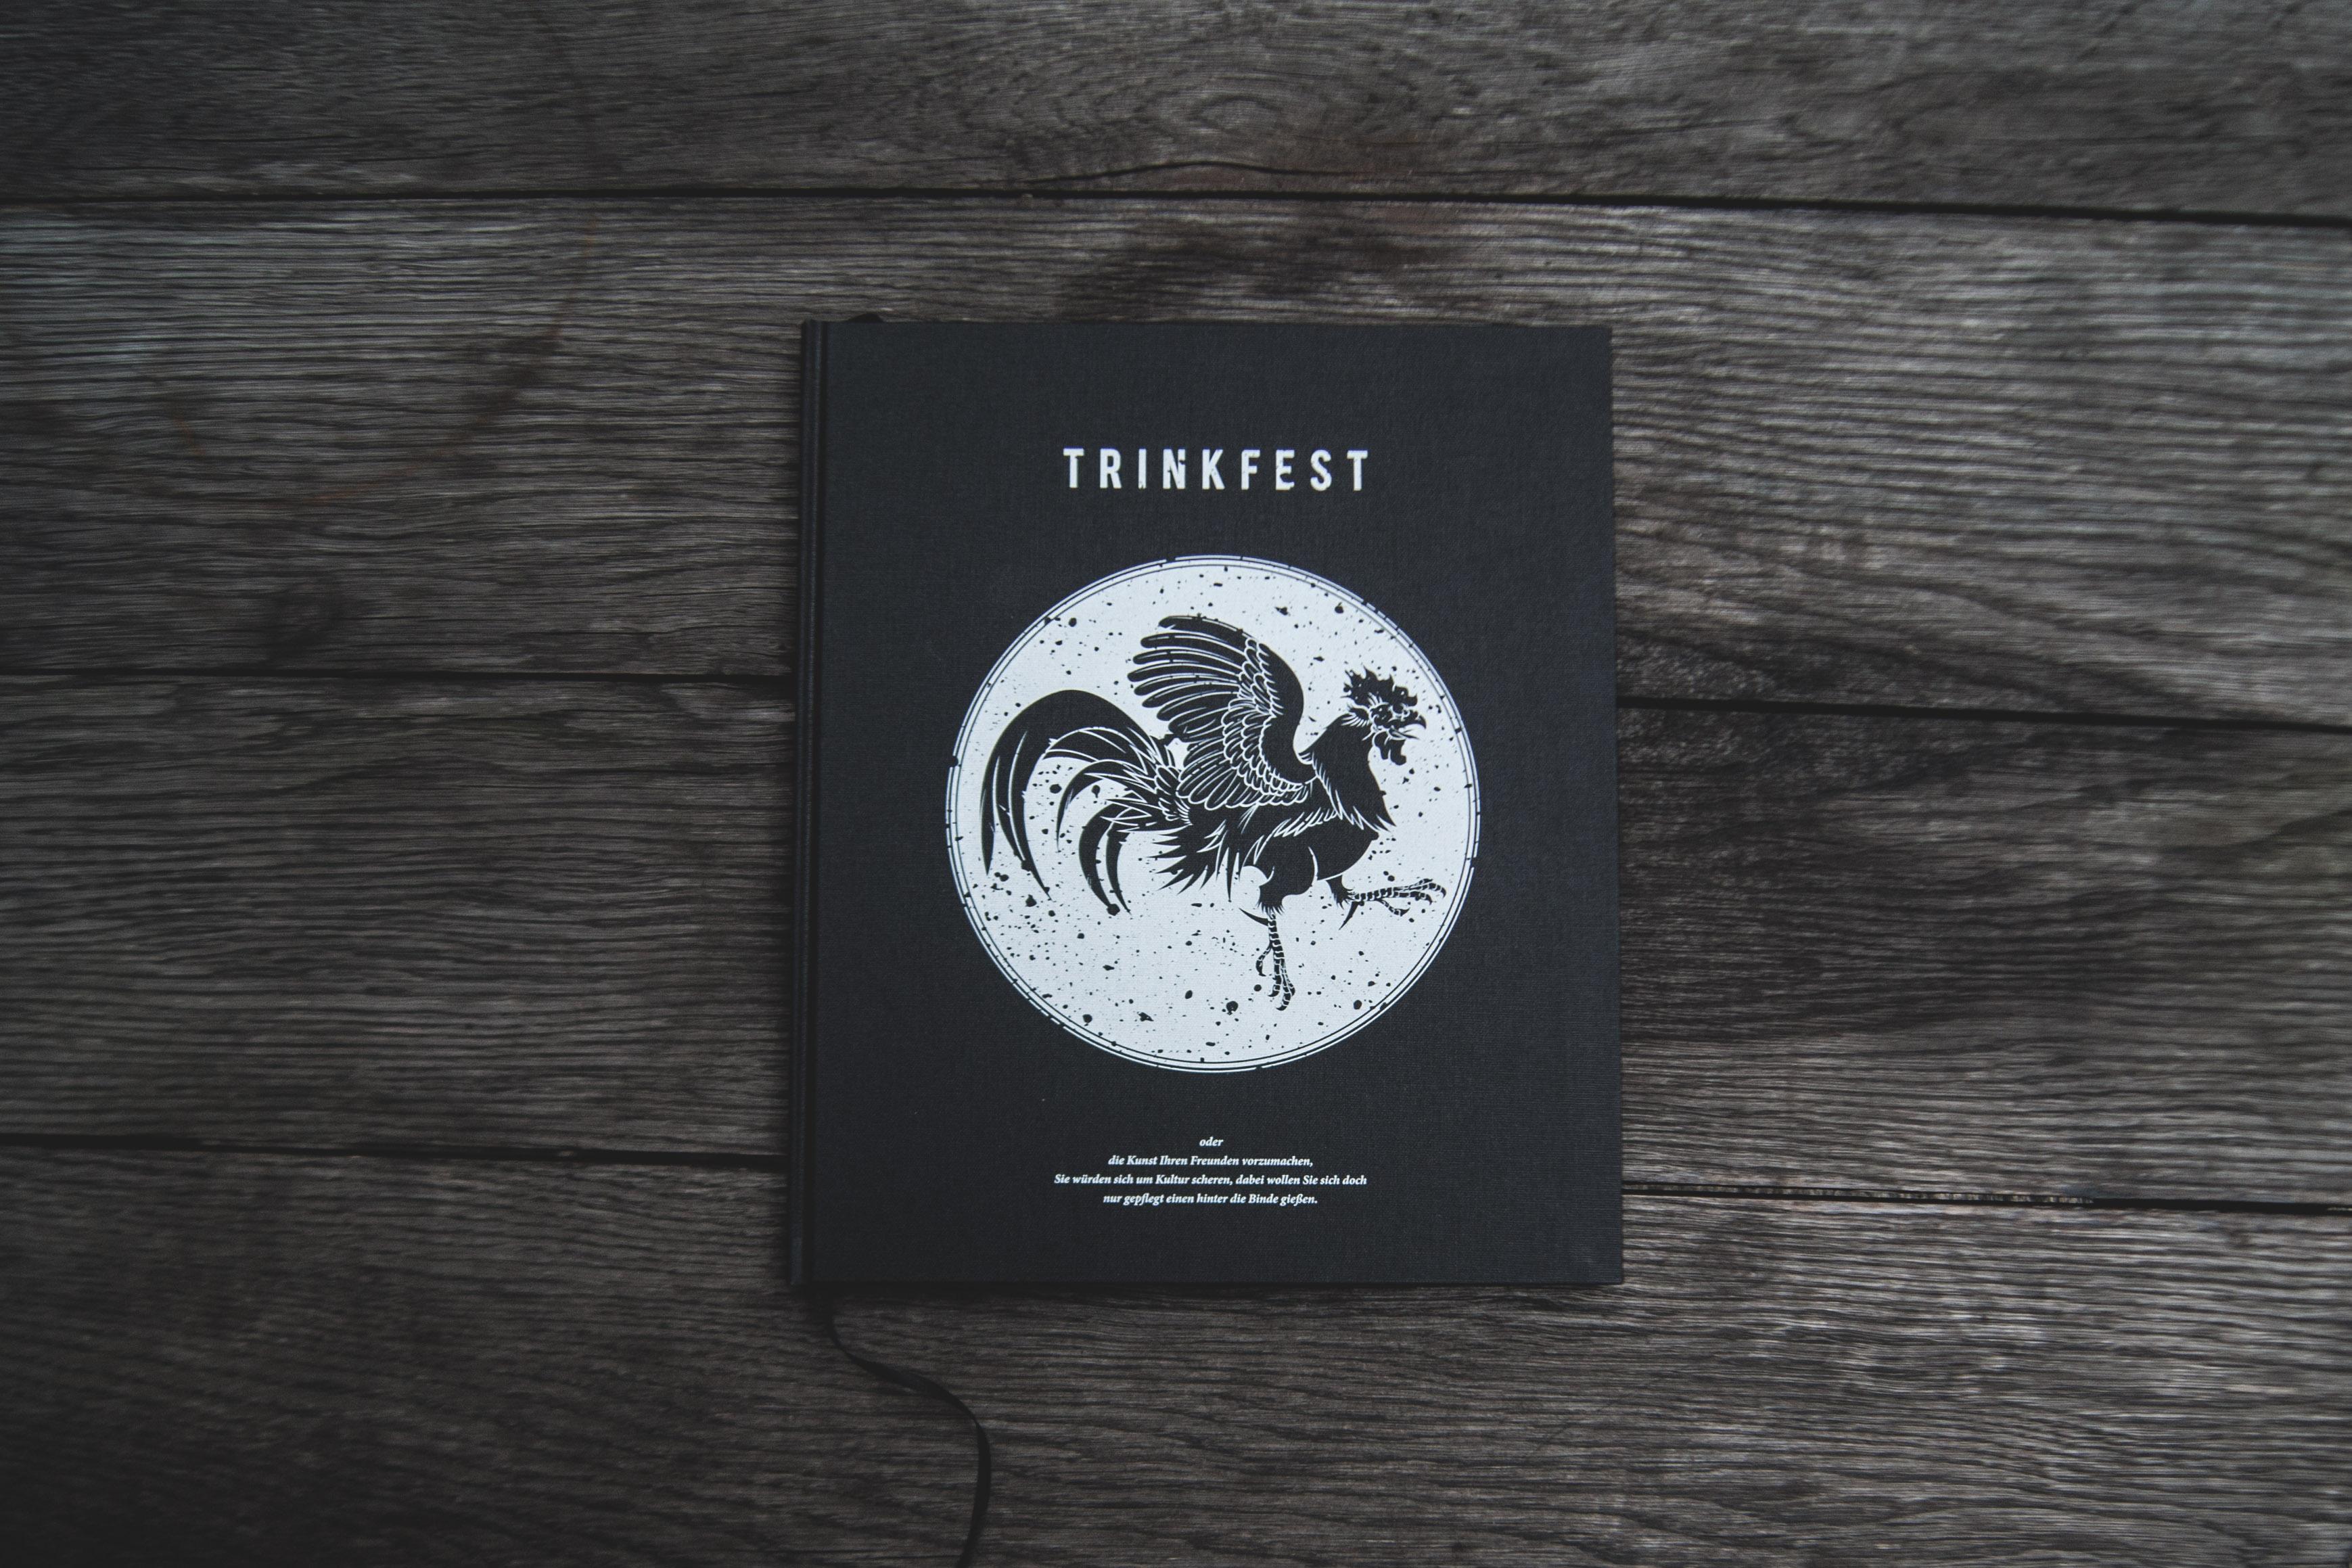 Cocktailbuch - Trinkfest